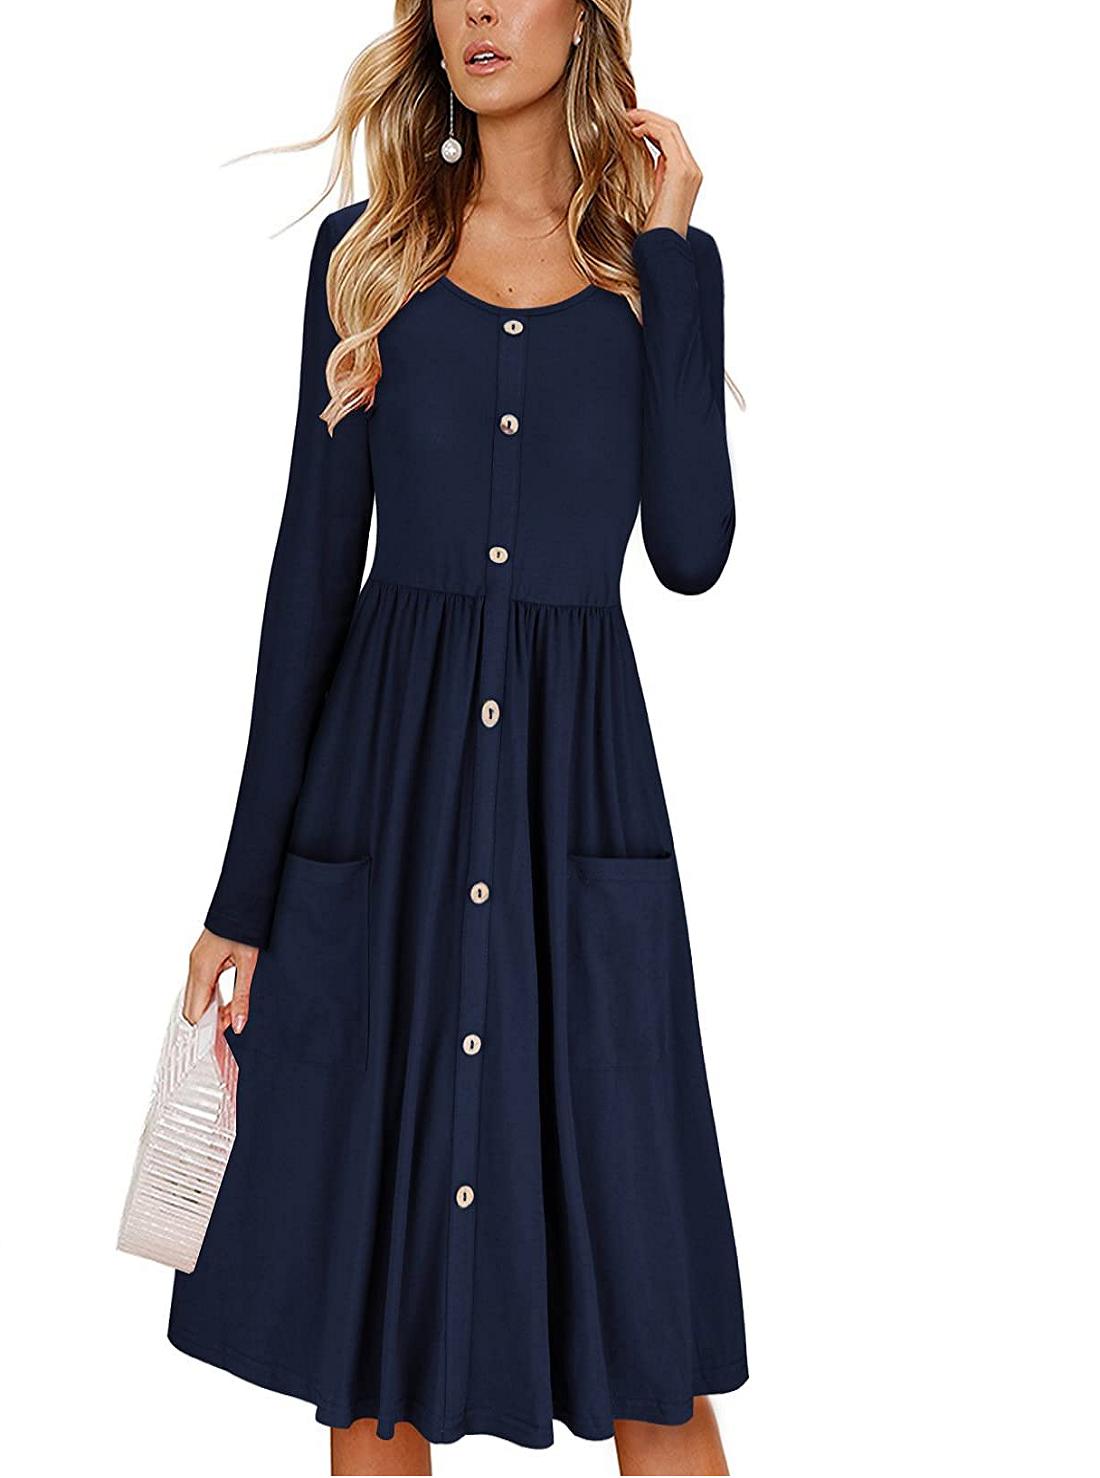 7 Wholesale Casual Long Sleeve Dresses